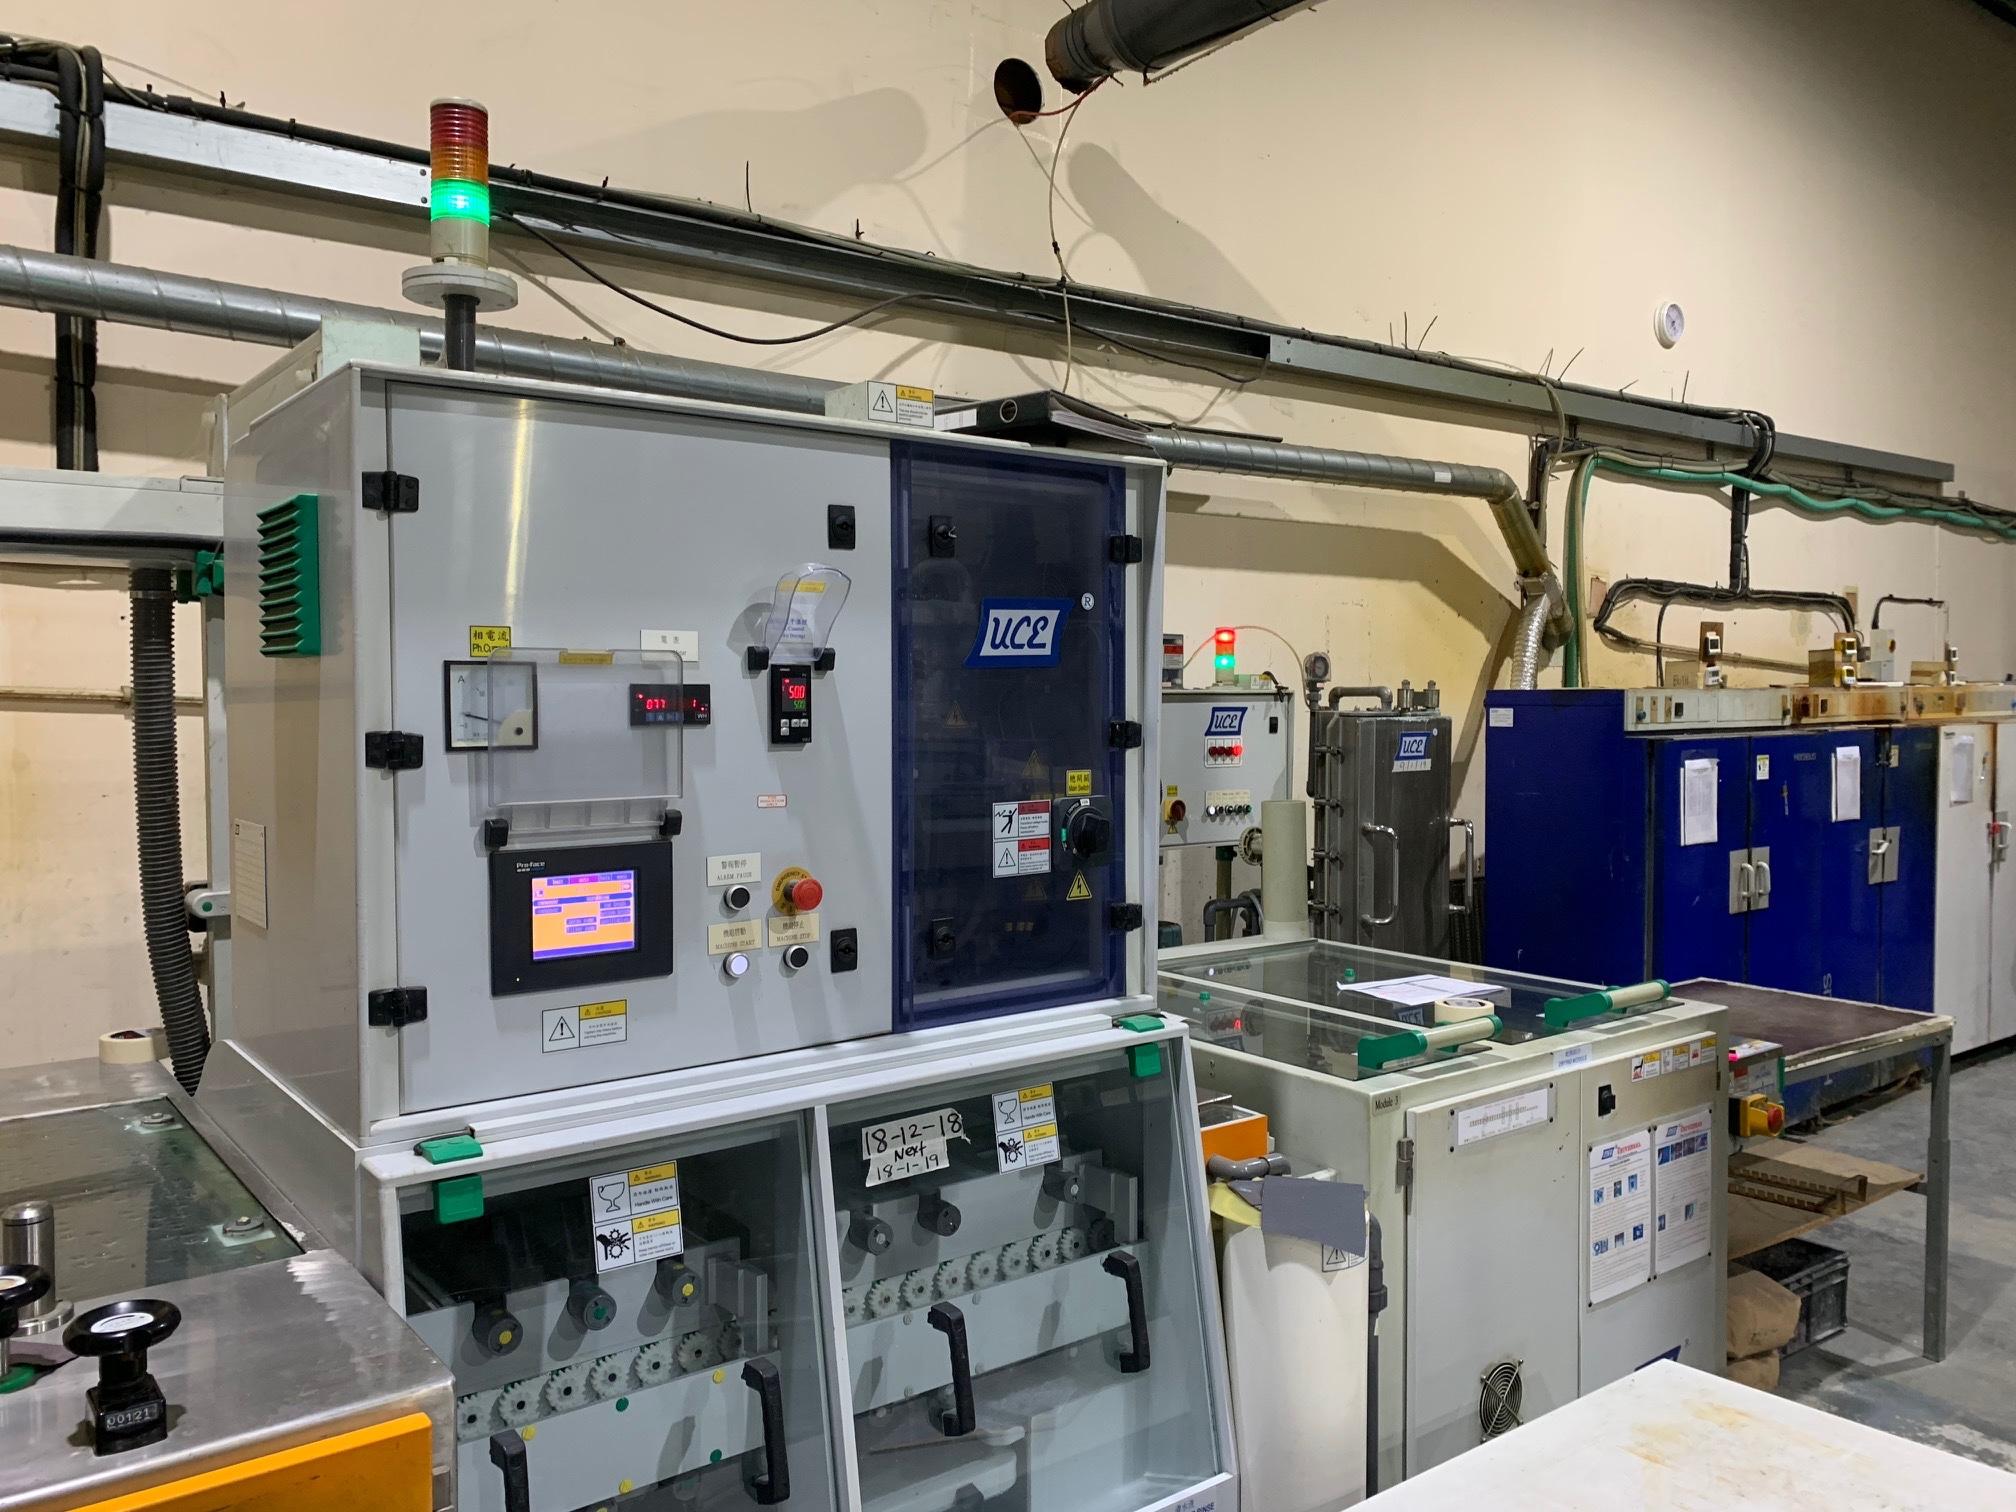 Garner Osborne - The PCB Manufacturer! Over 26 years of